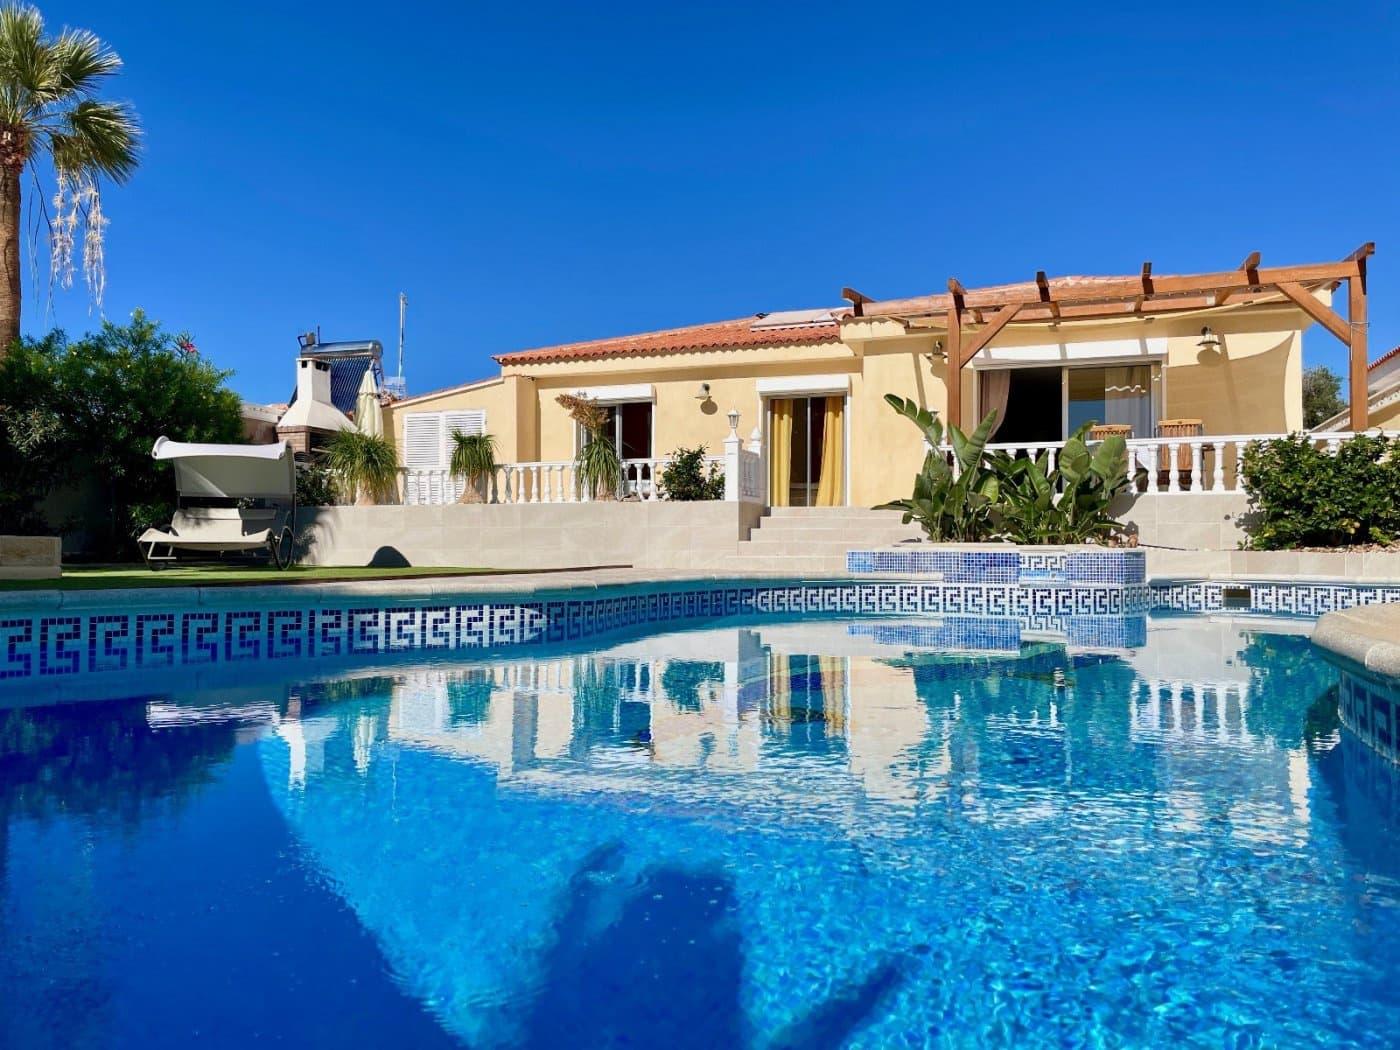 4 sovrum Bungalow till salu i Callao Salvaje med pool - 590 000 € (Ref: 5910560)